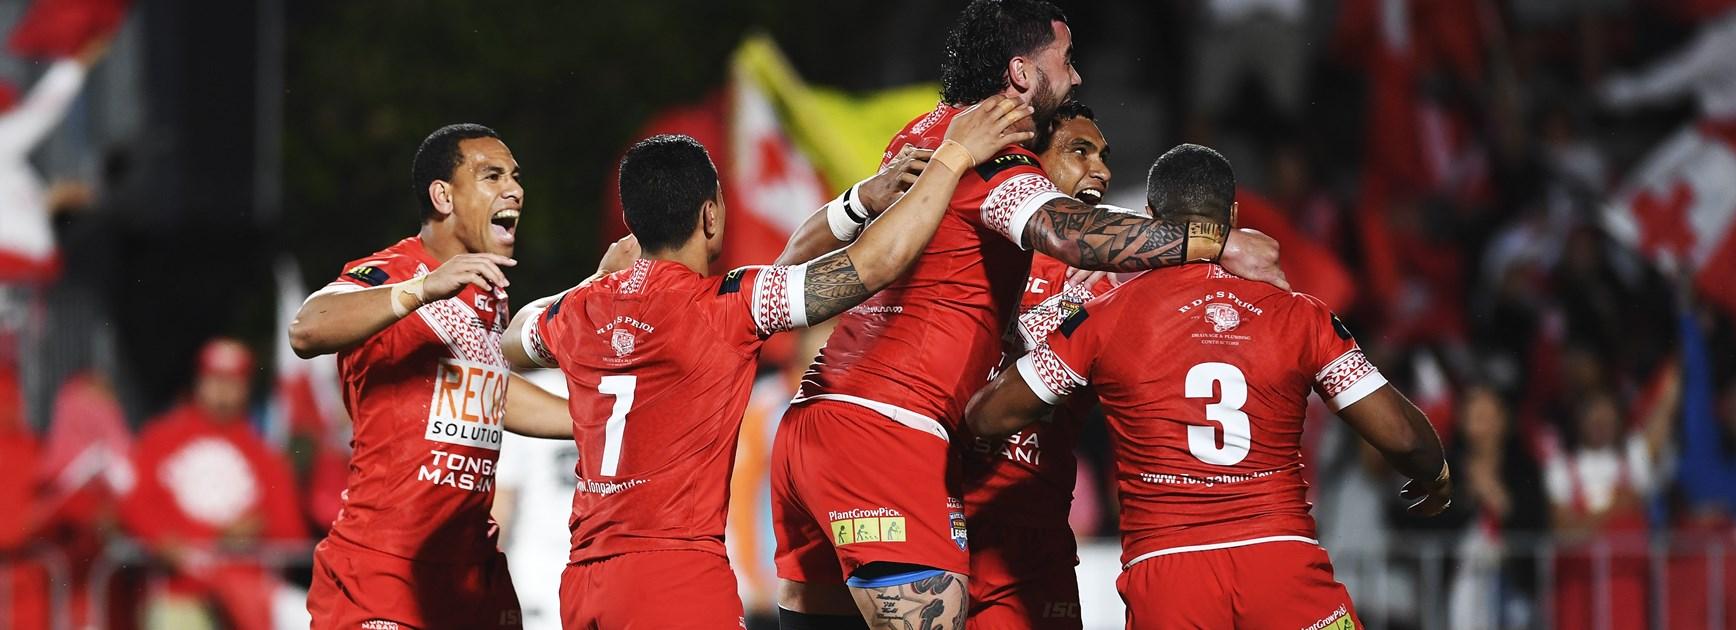 Pangai's dream to turn Tonga into force on world stage